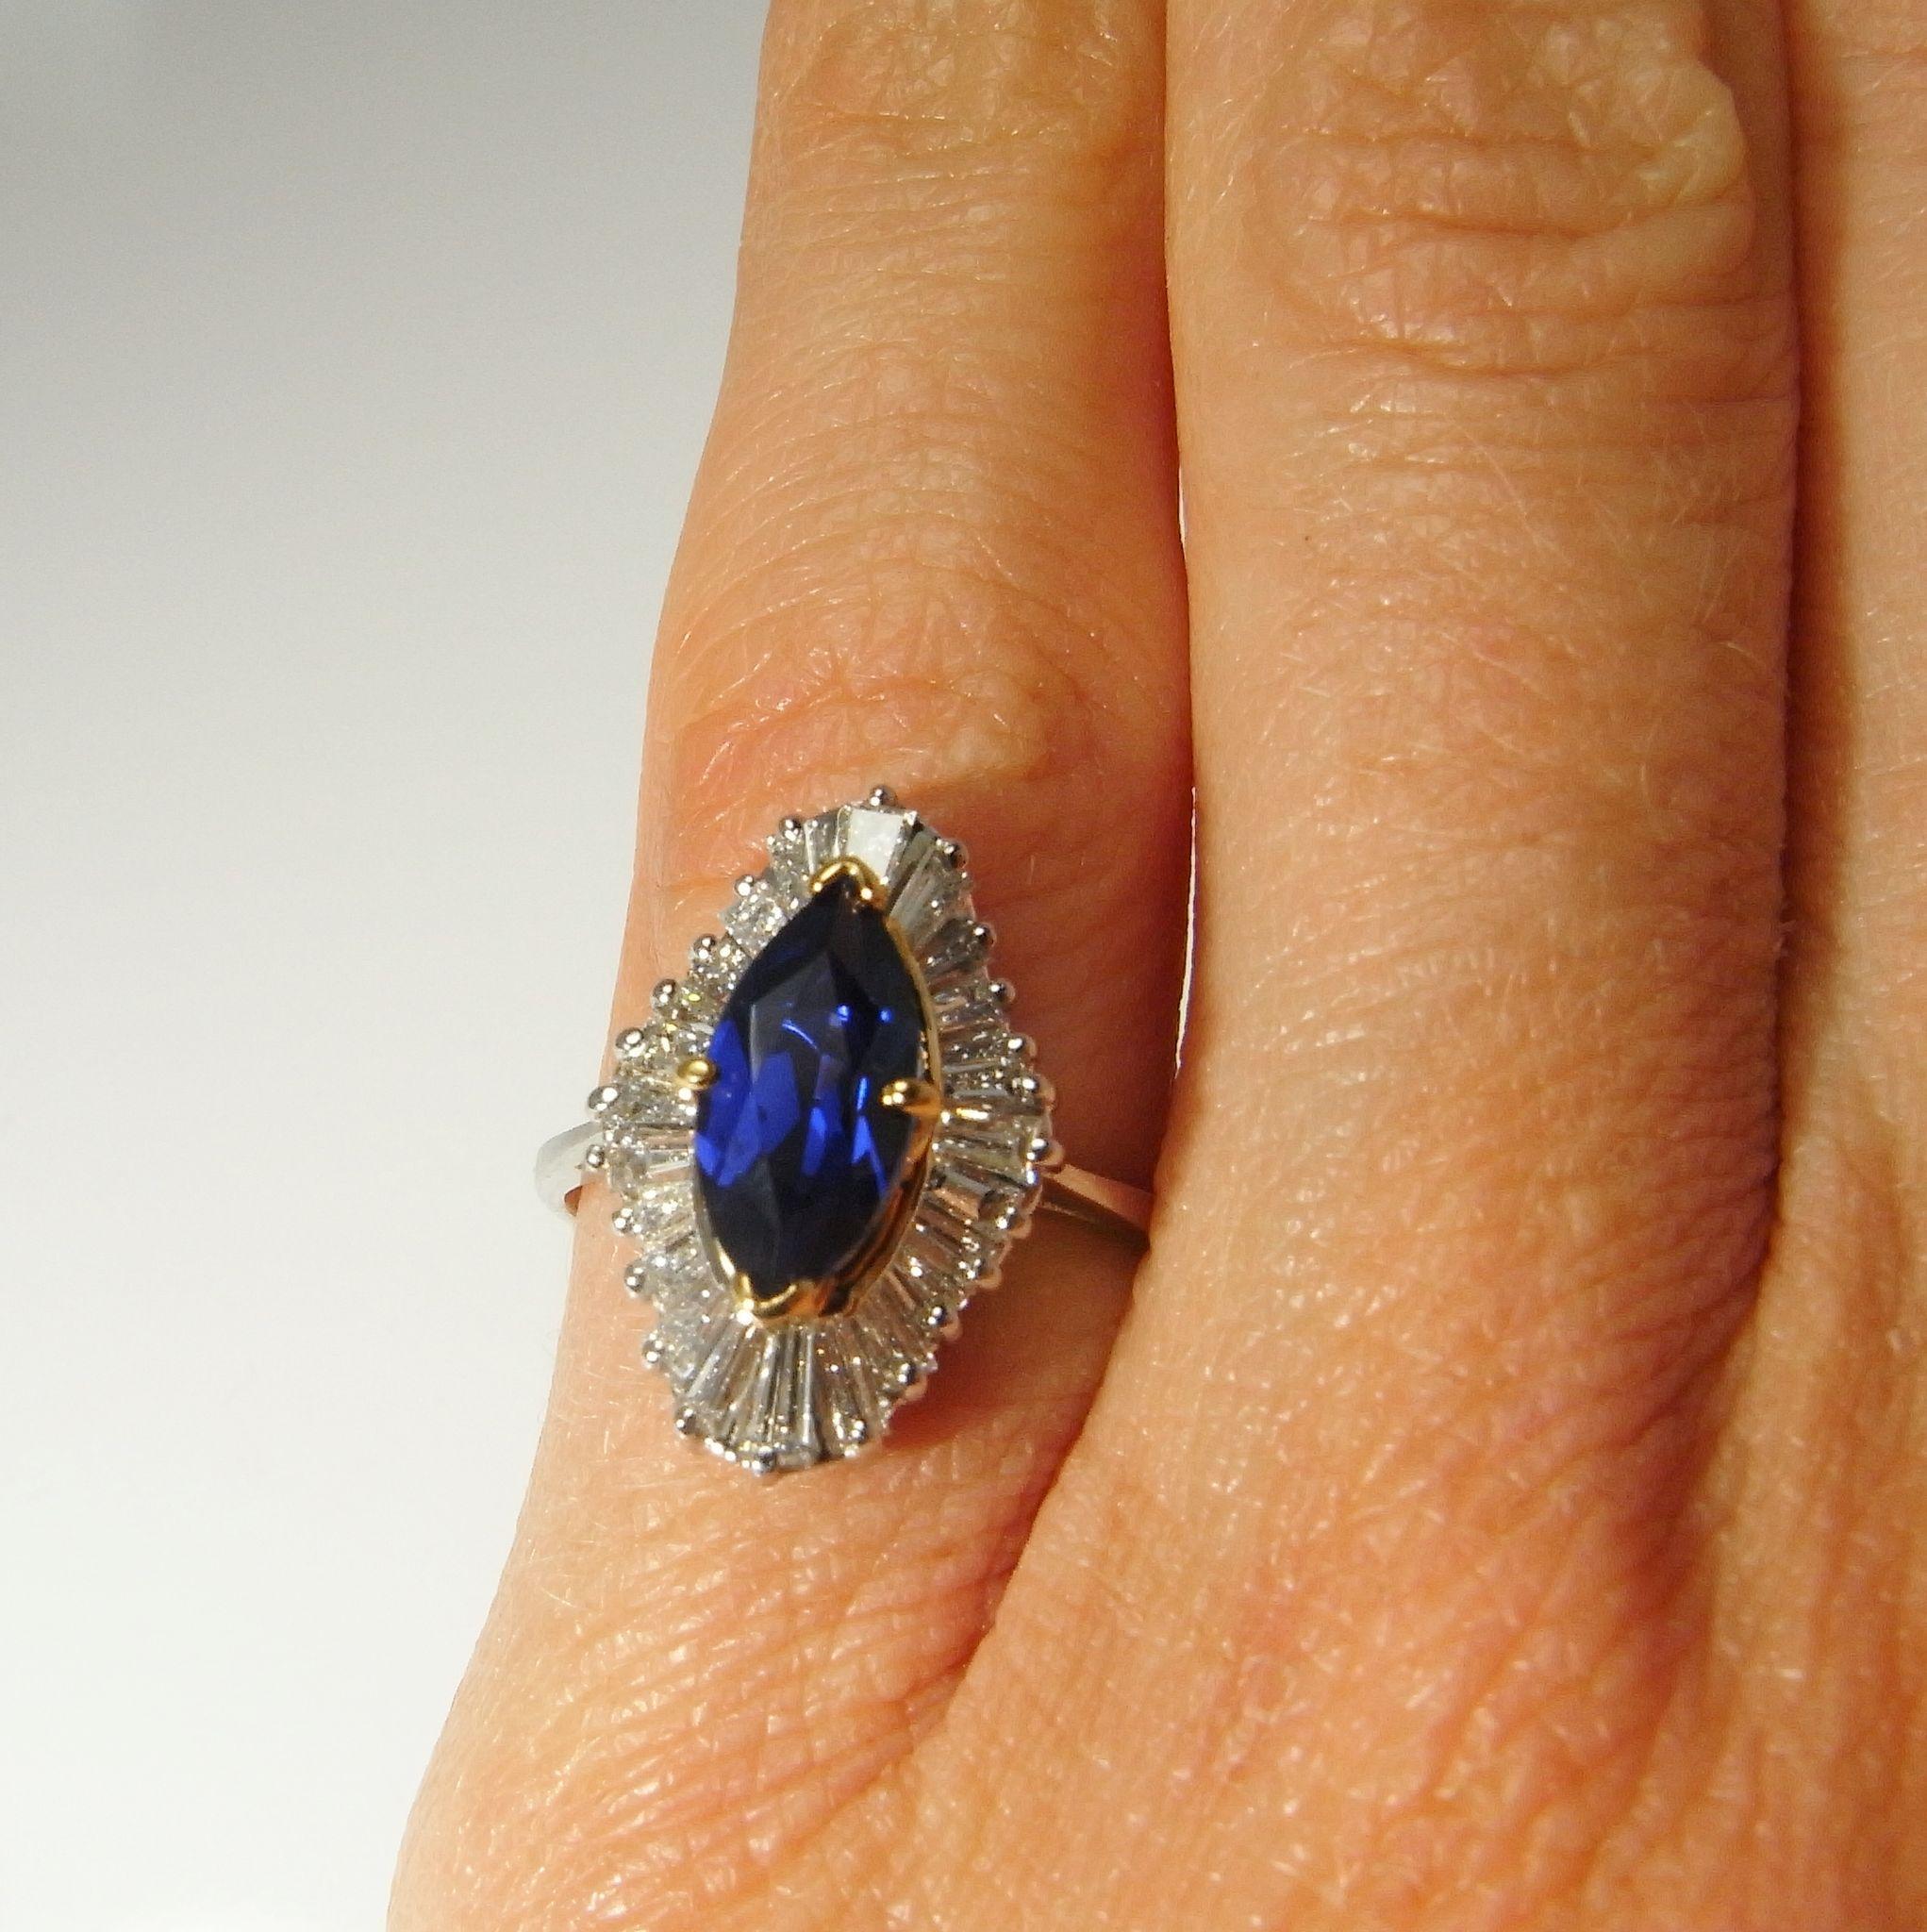 Vivid Blue Gem Sapphire Diamond Engagement Ring Wedding Ring from